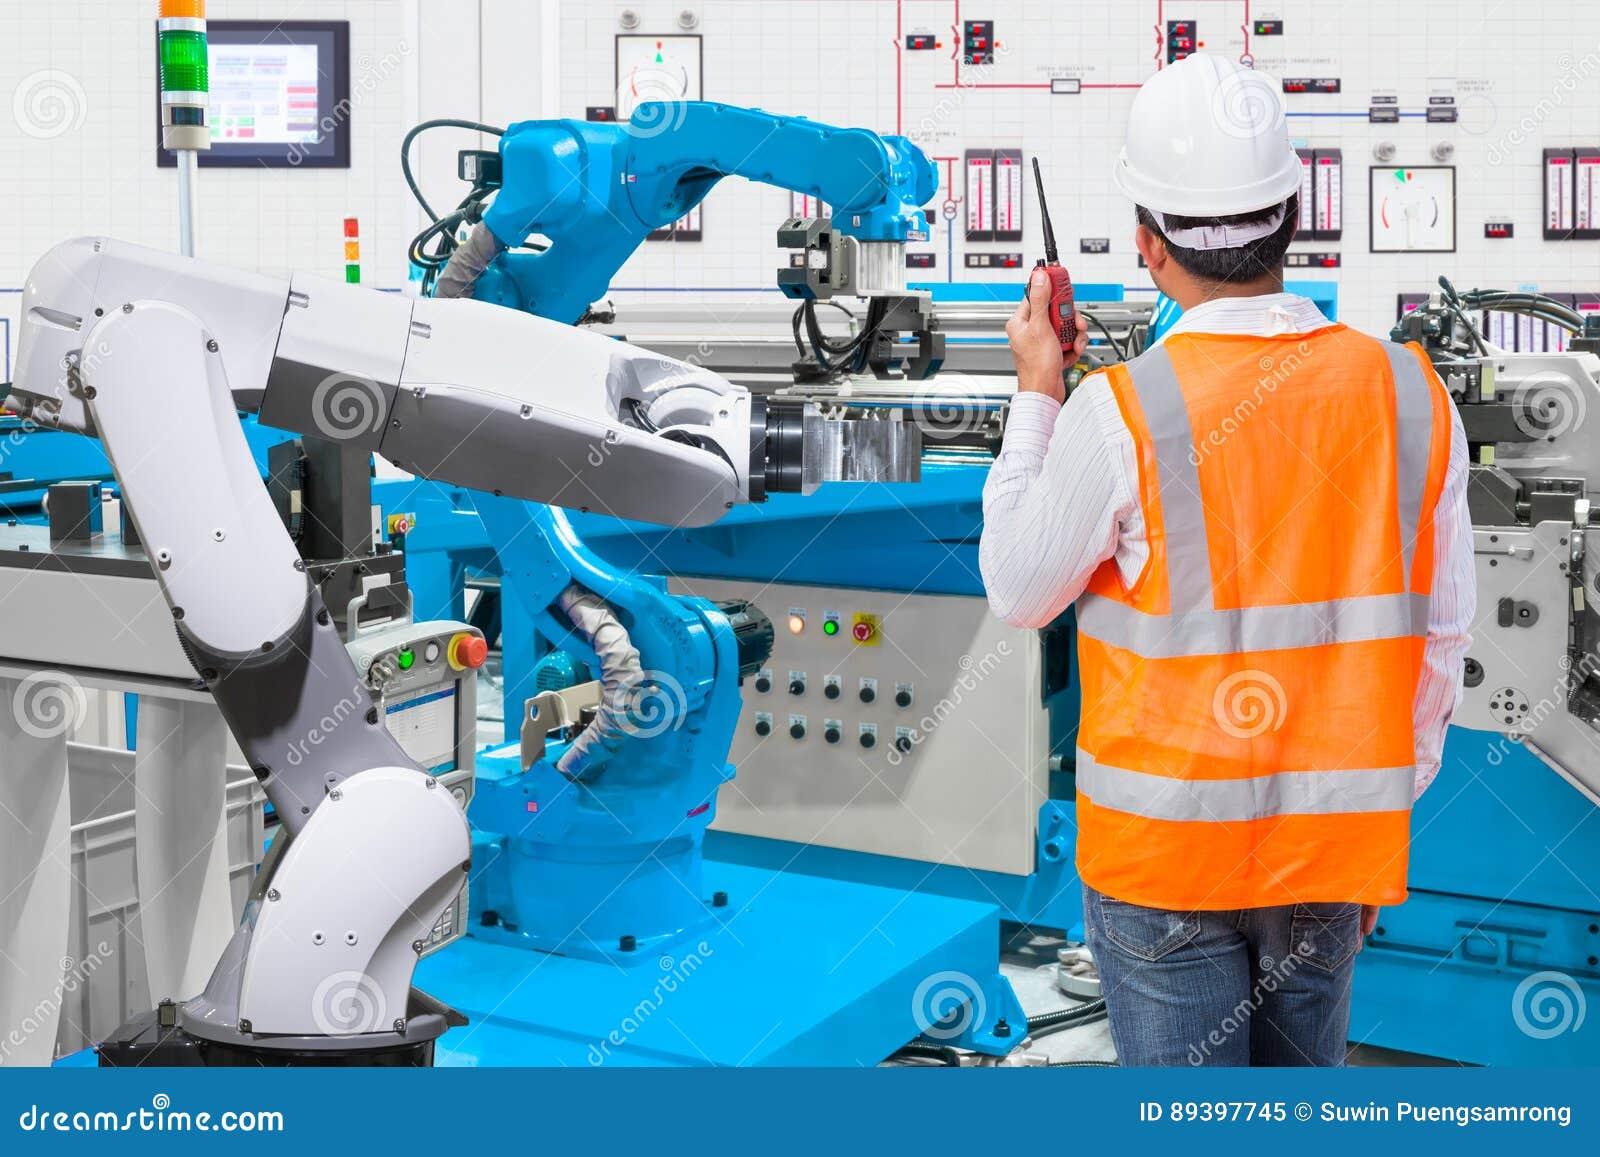 Maintenance engineer control automatic robotic hand machine tool